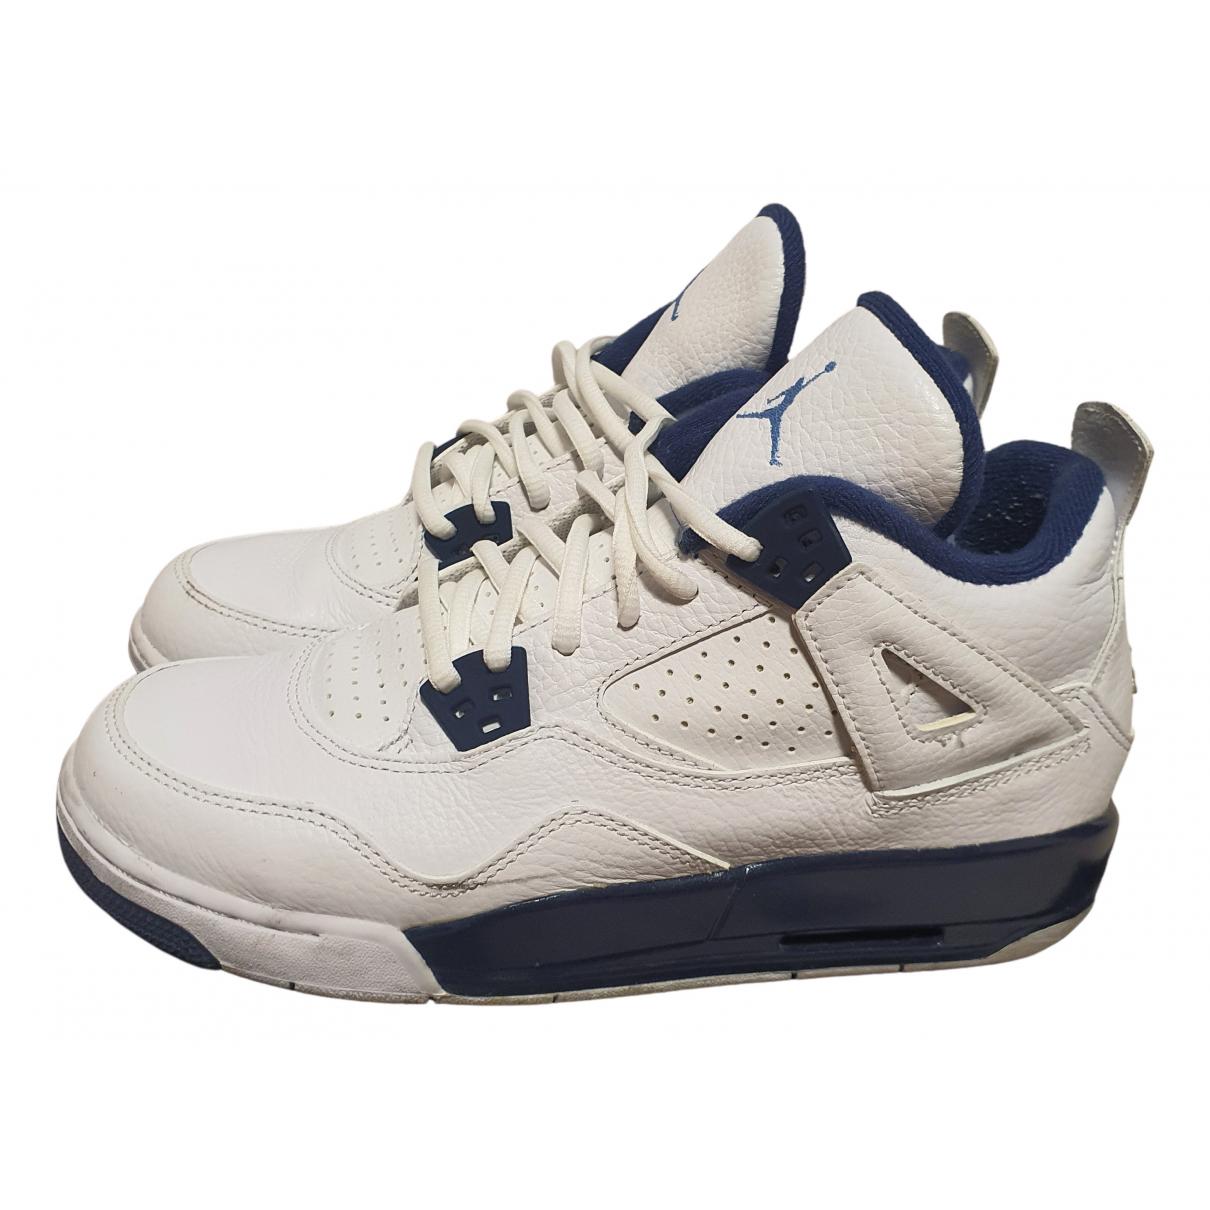 Jordan - Baskets Air Jordan 4 pour femme en cuir - blanc